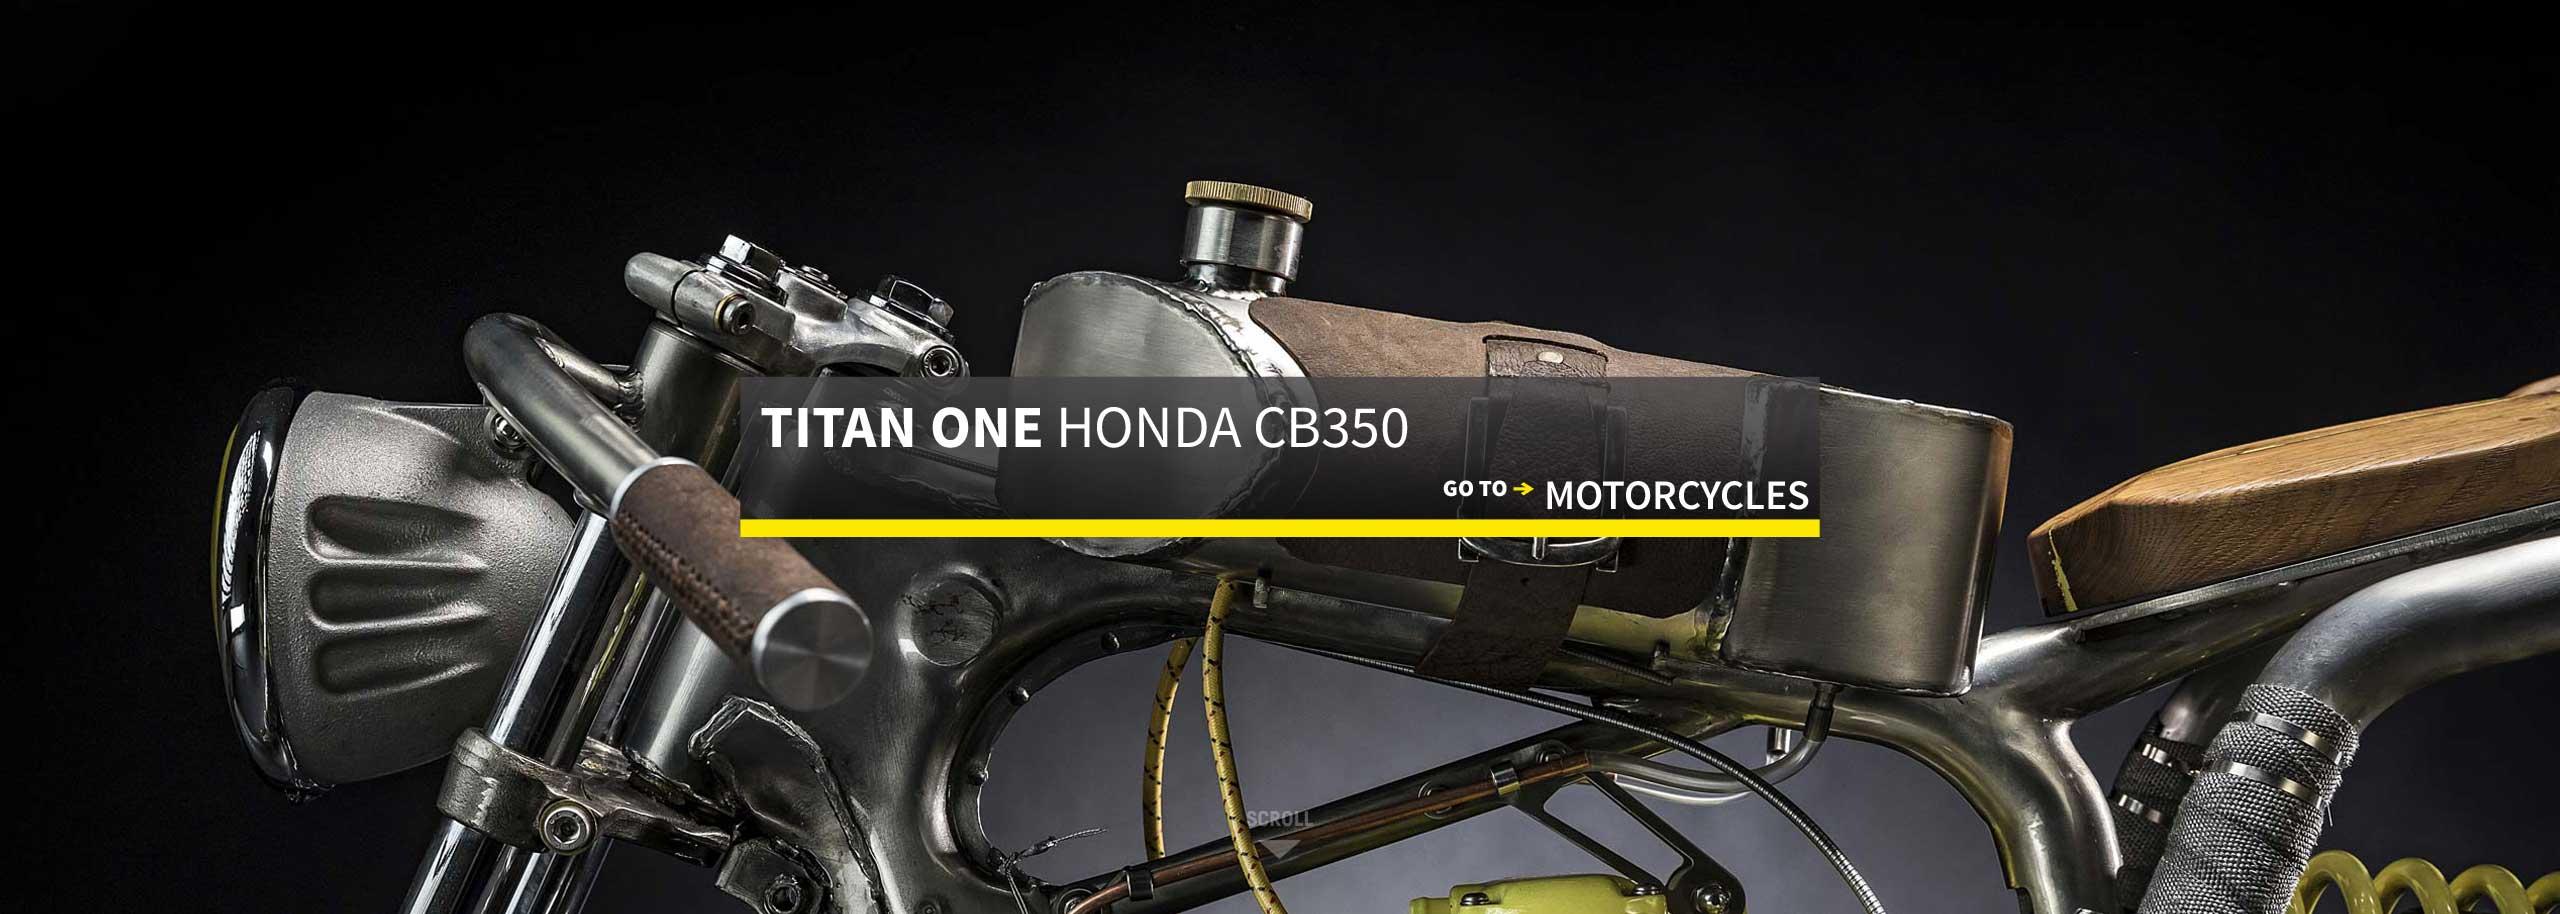 Titan-Motorcycles_TITAN-One-Honda-CB350-CafeRacer-CustomBike-Graz-Austria-Individuell-Umbau